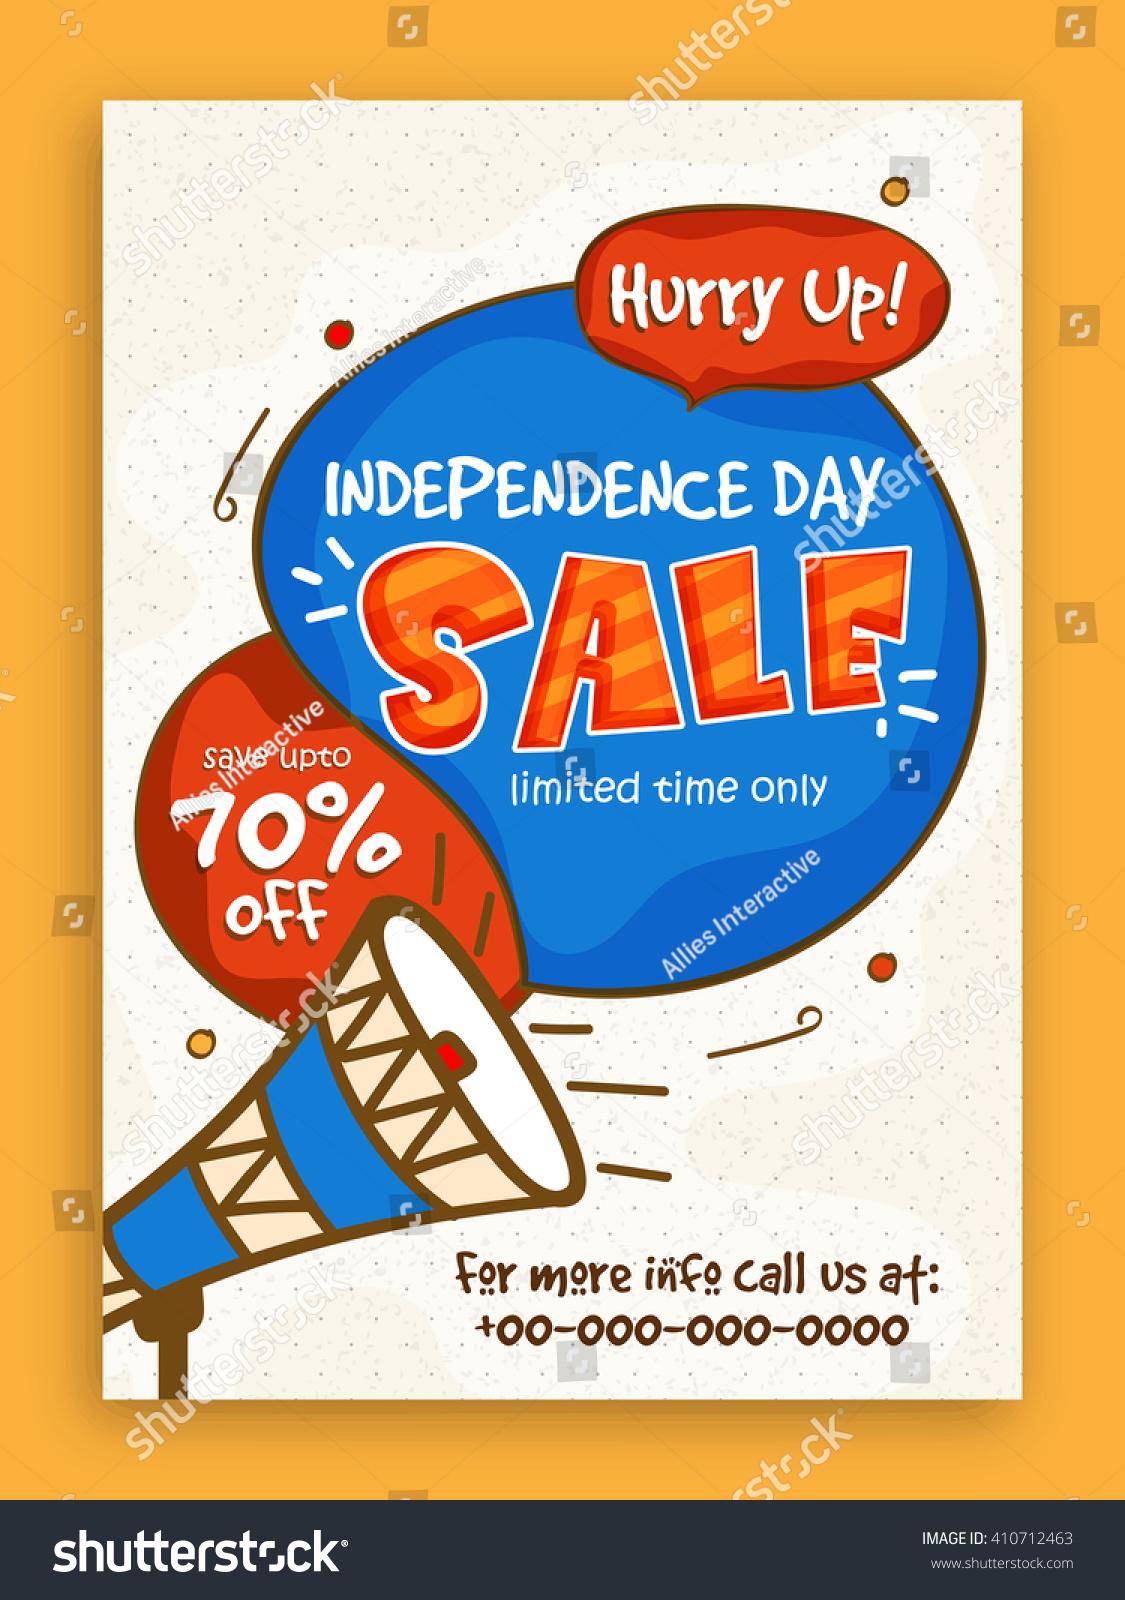 pamphlet banner flyer design 70 stock vector 410712463 pamphlet banner or flyer design 70% discount offer on occasion of american